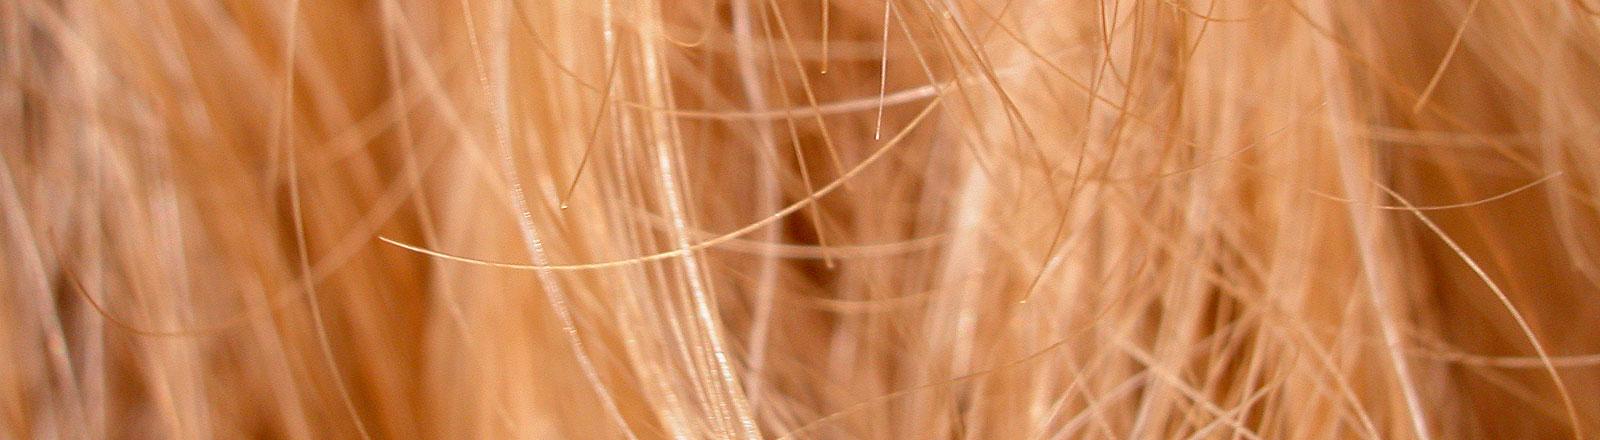 Blonde Haare in Nahaufnahme